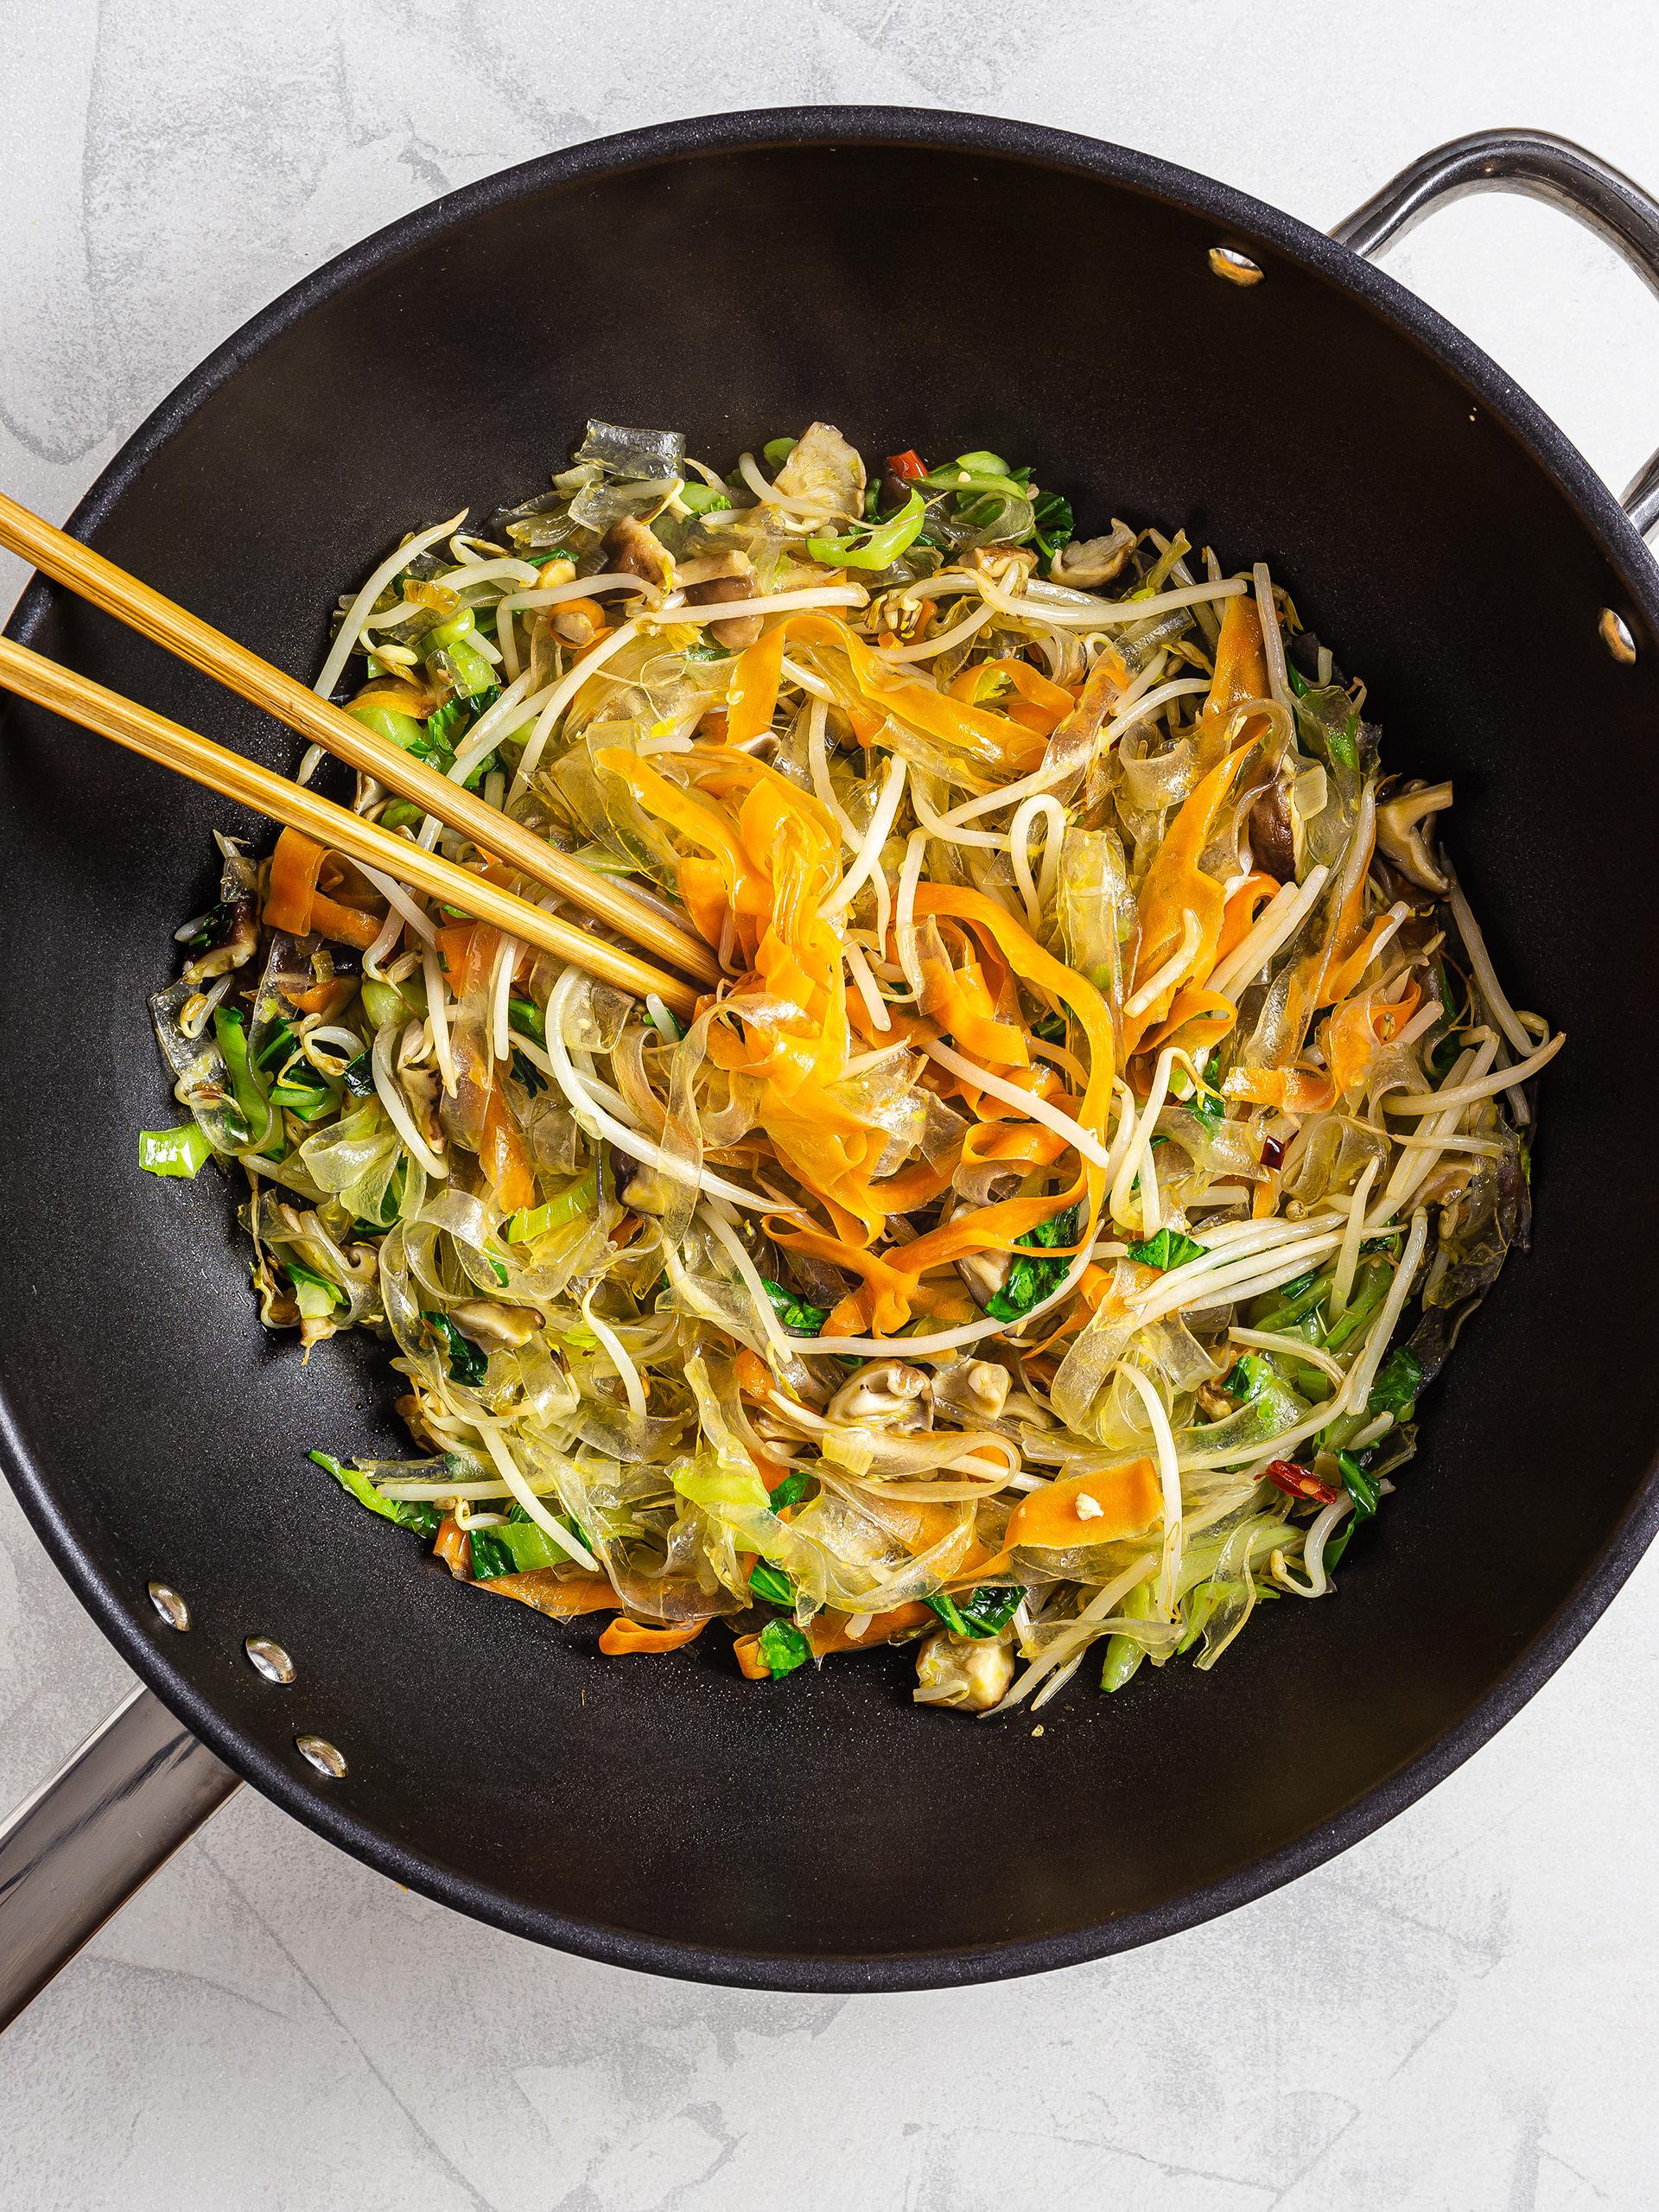 Pad woon sen stir fry with vegetables